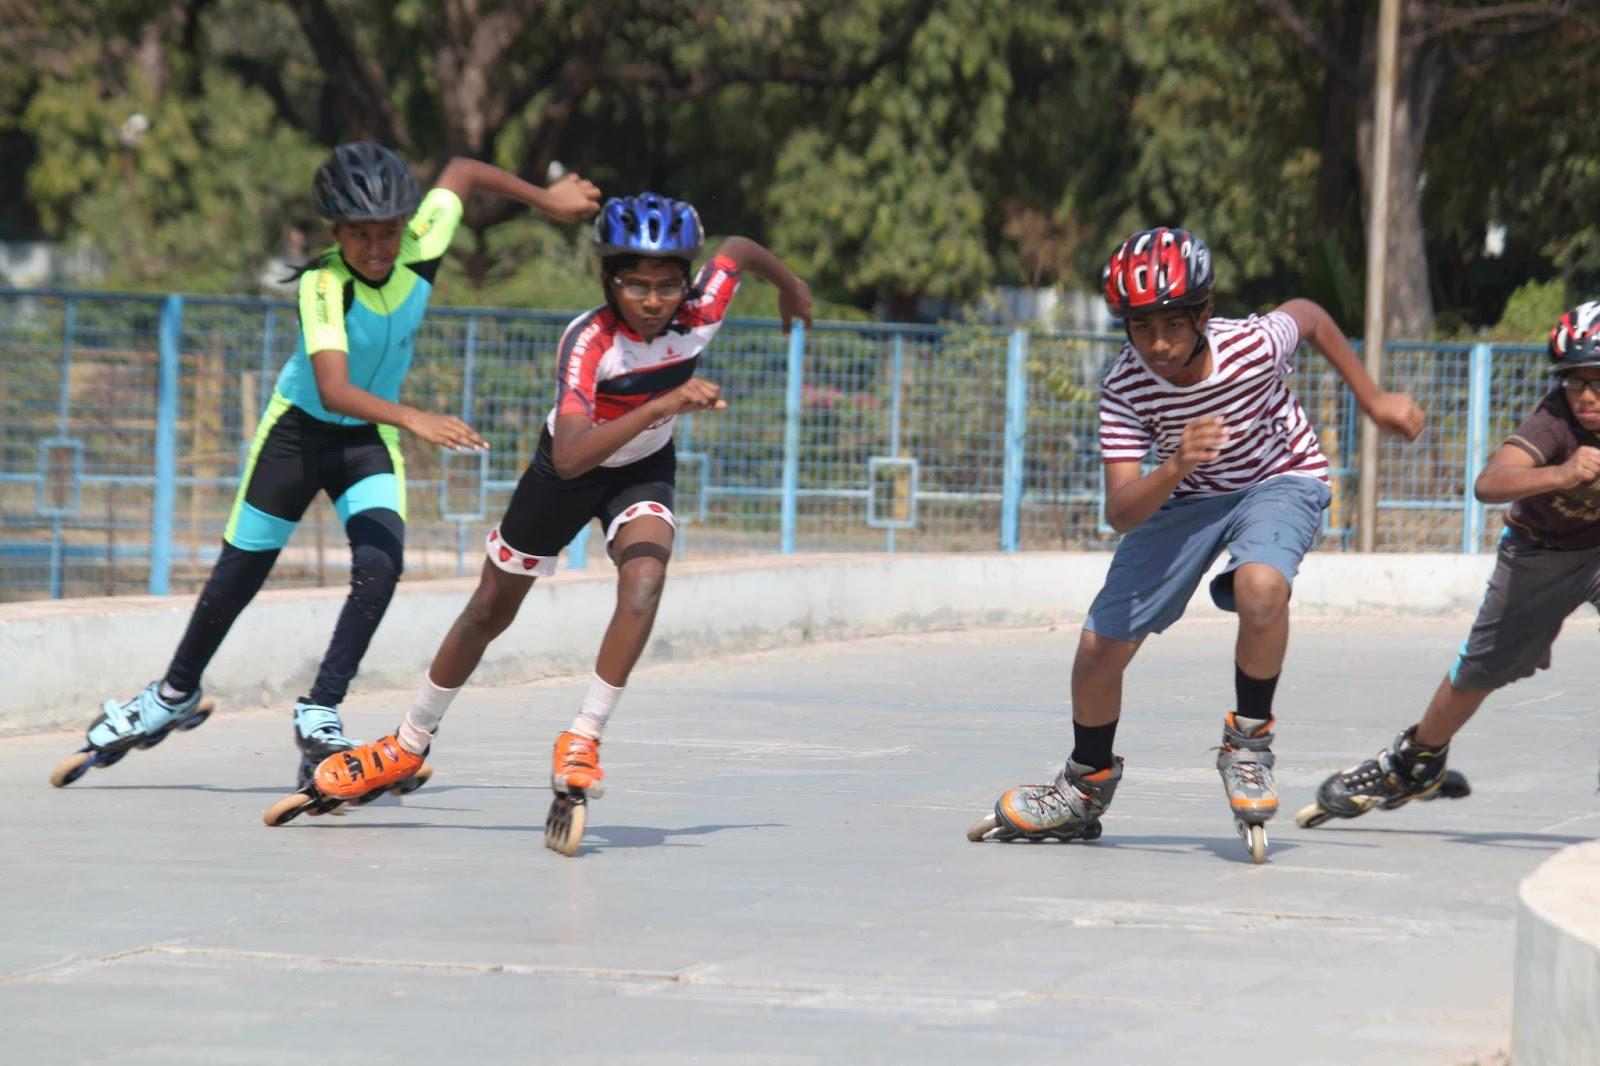 skating classes at shamshabad in hyderabad scating shoes sketing shoes skateing skate shoes india